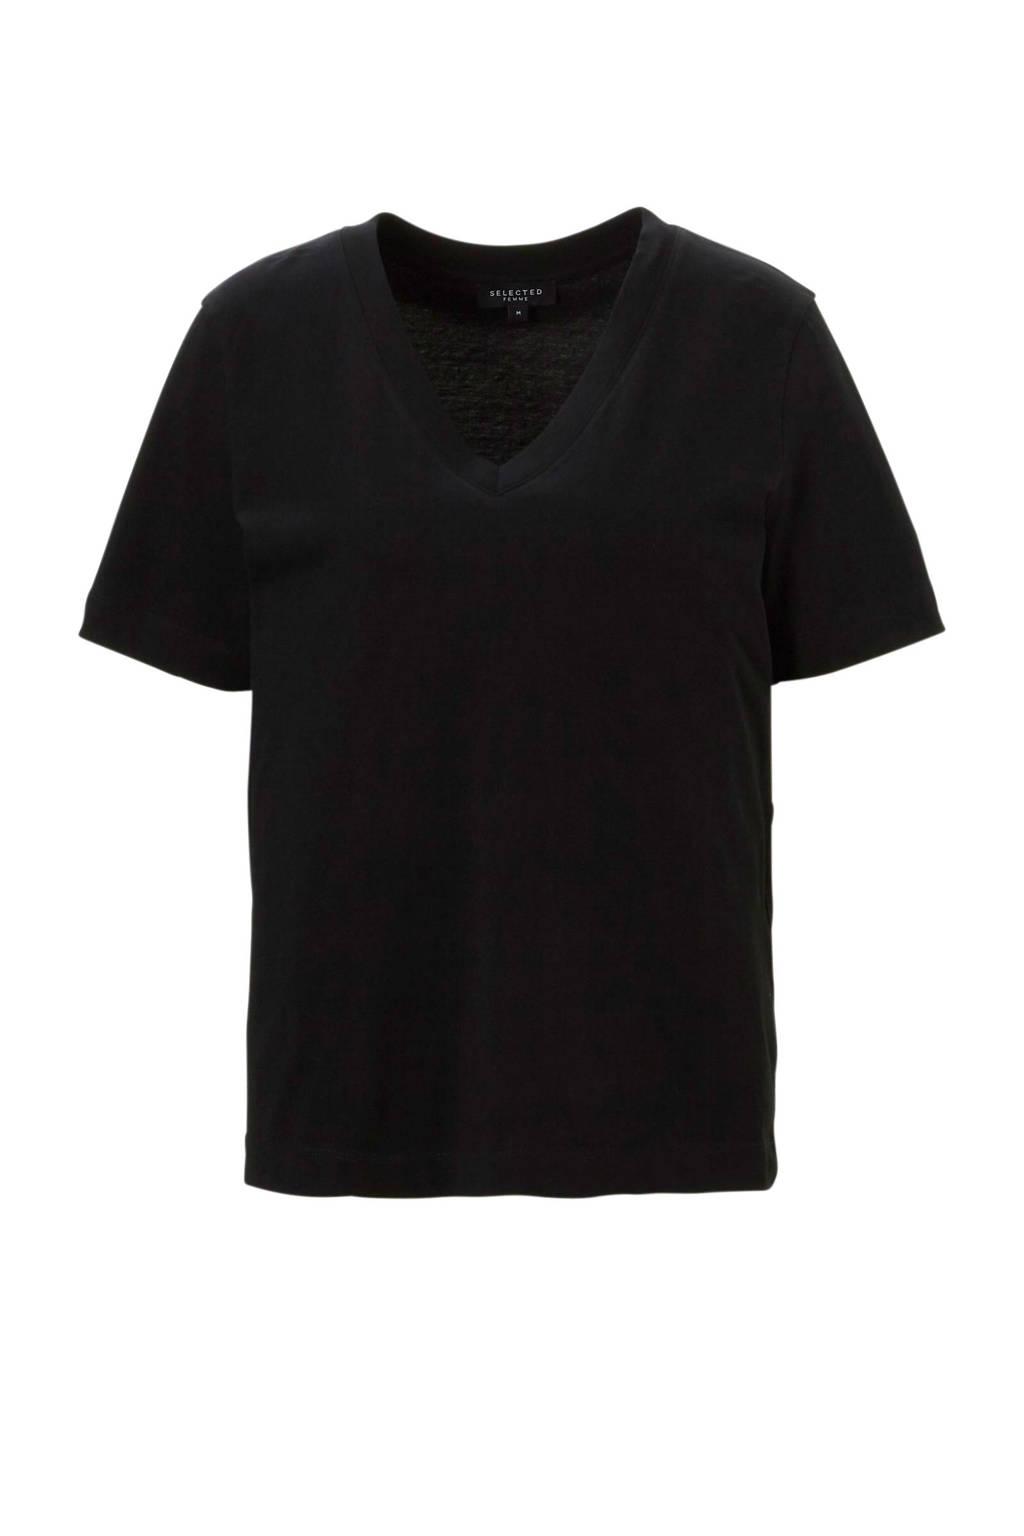 SELECTED FEMME T-shirt met V-hals, Zwart